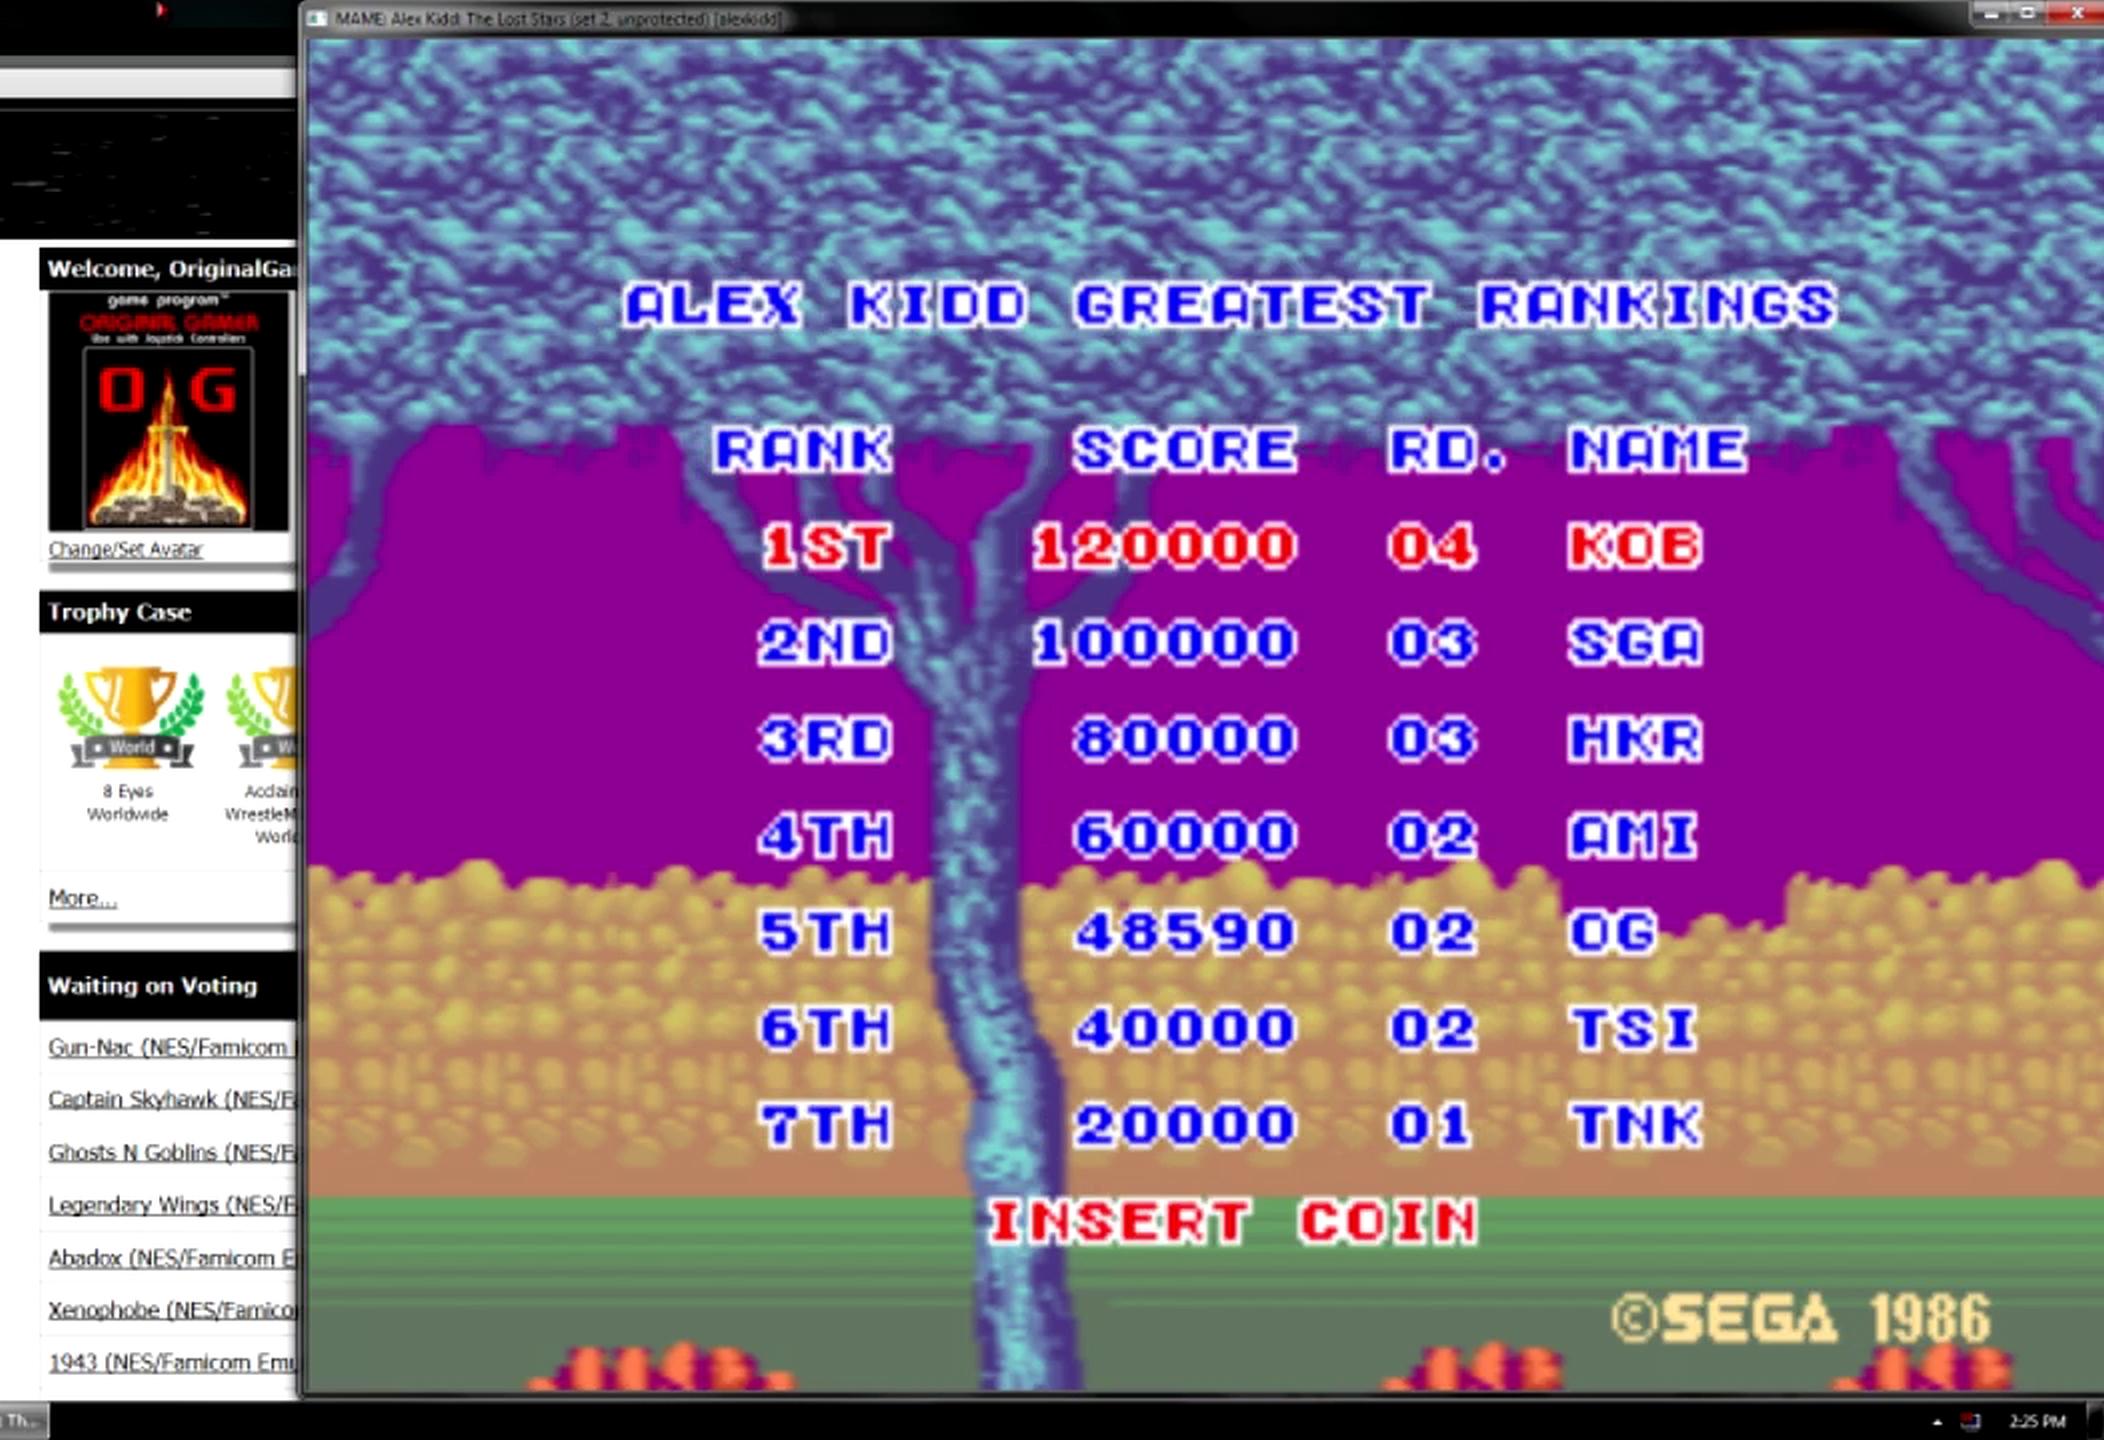 OriginalGamer: Alex Kidd: The Lost Stars [alexkidd] (Arcade Emulated / M.A.M.E.) 48,590 points on 2015-05-27 19:43:25